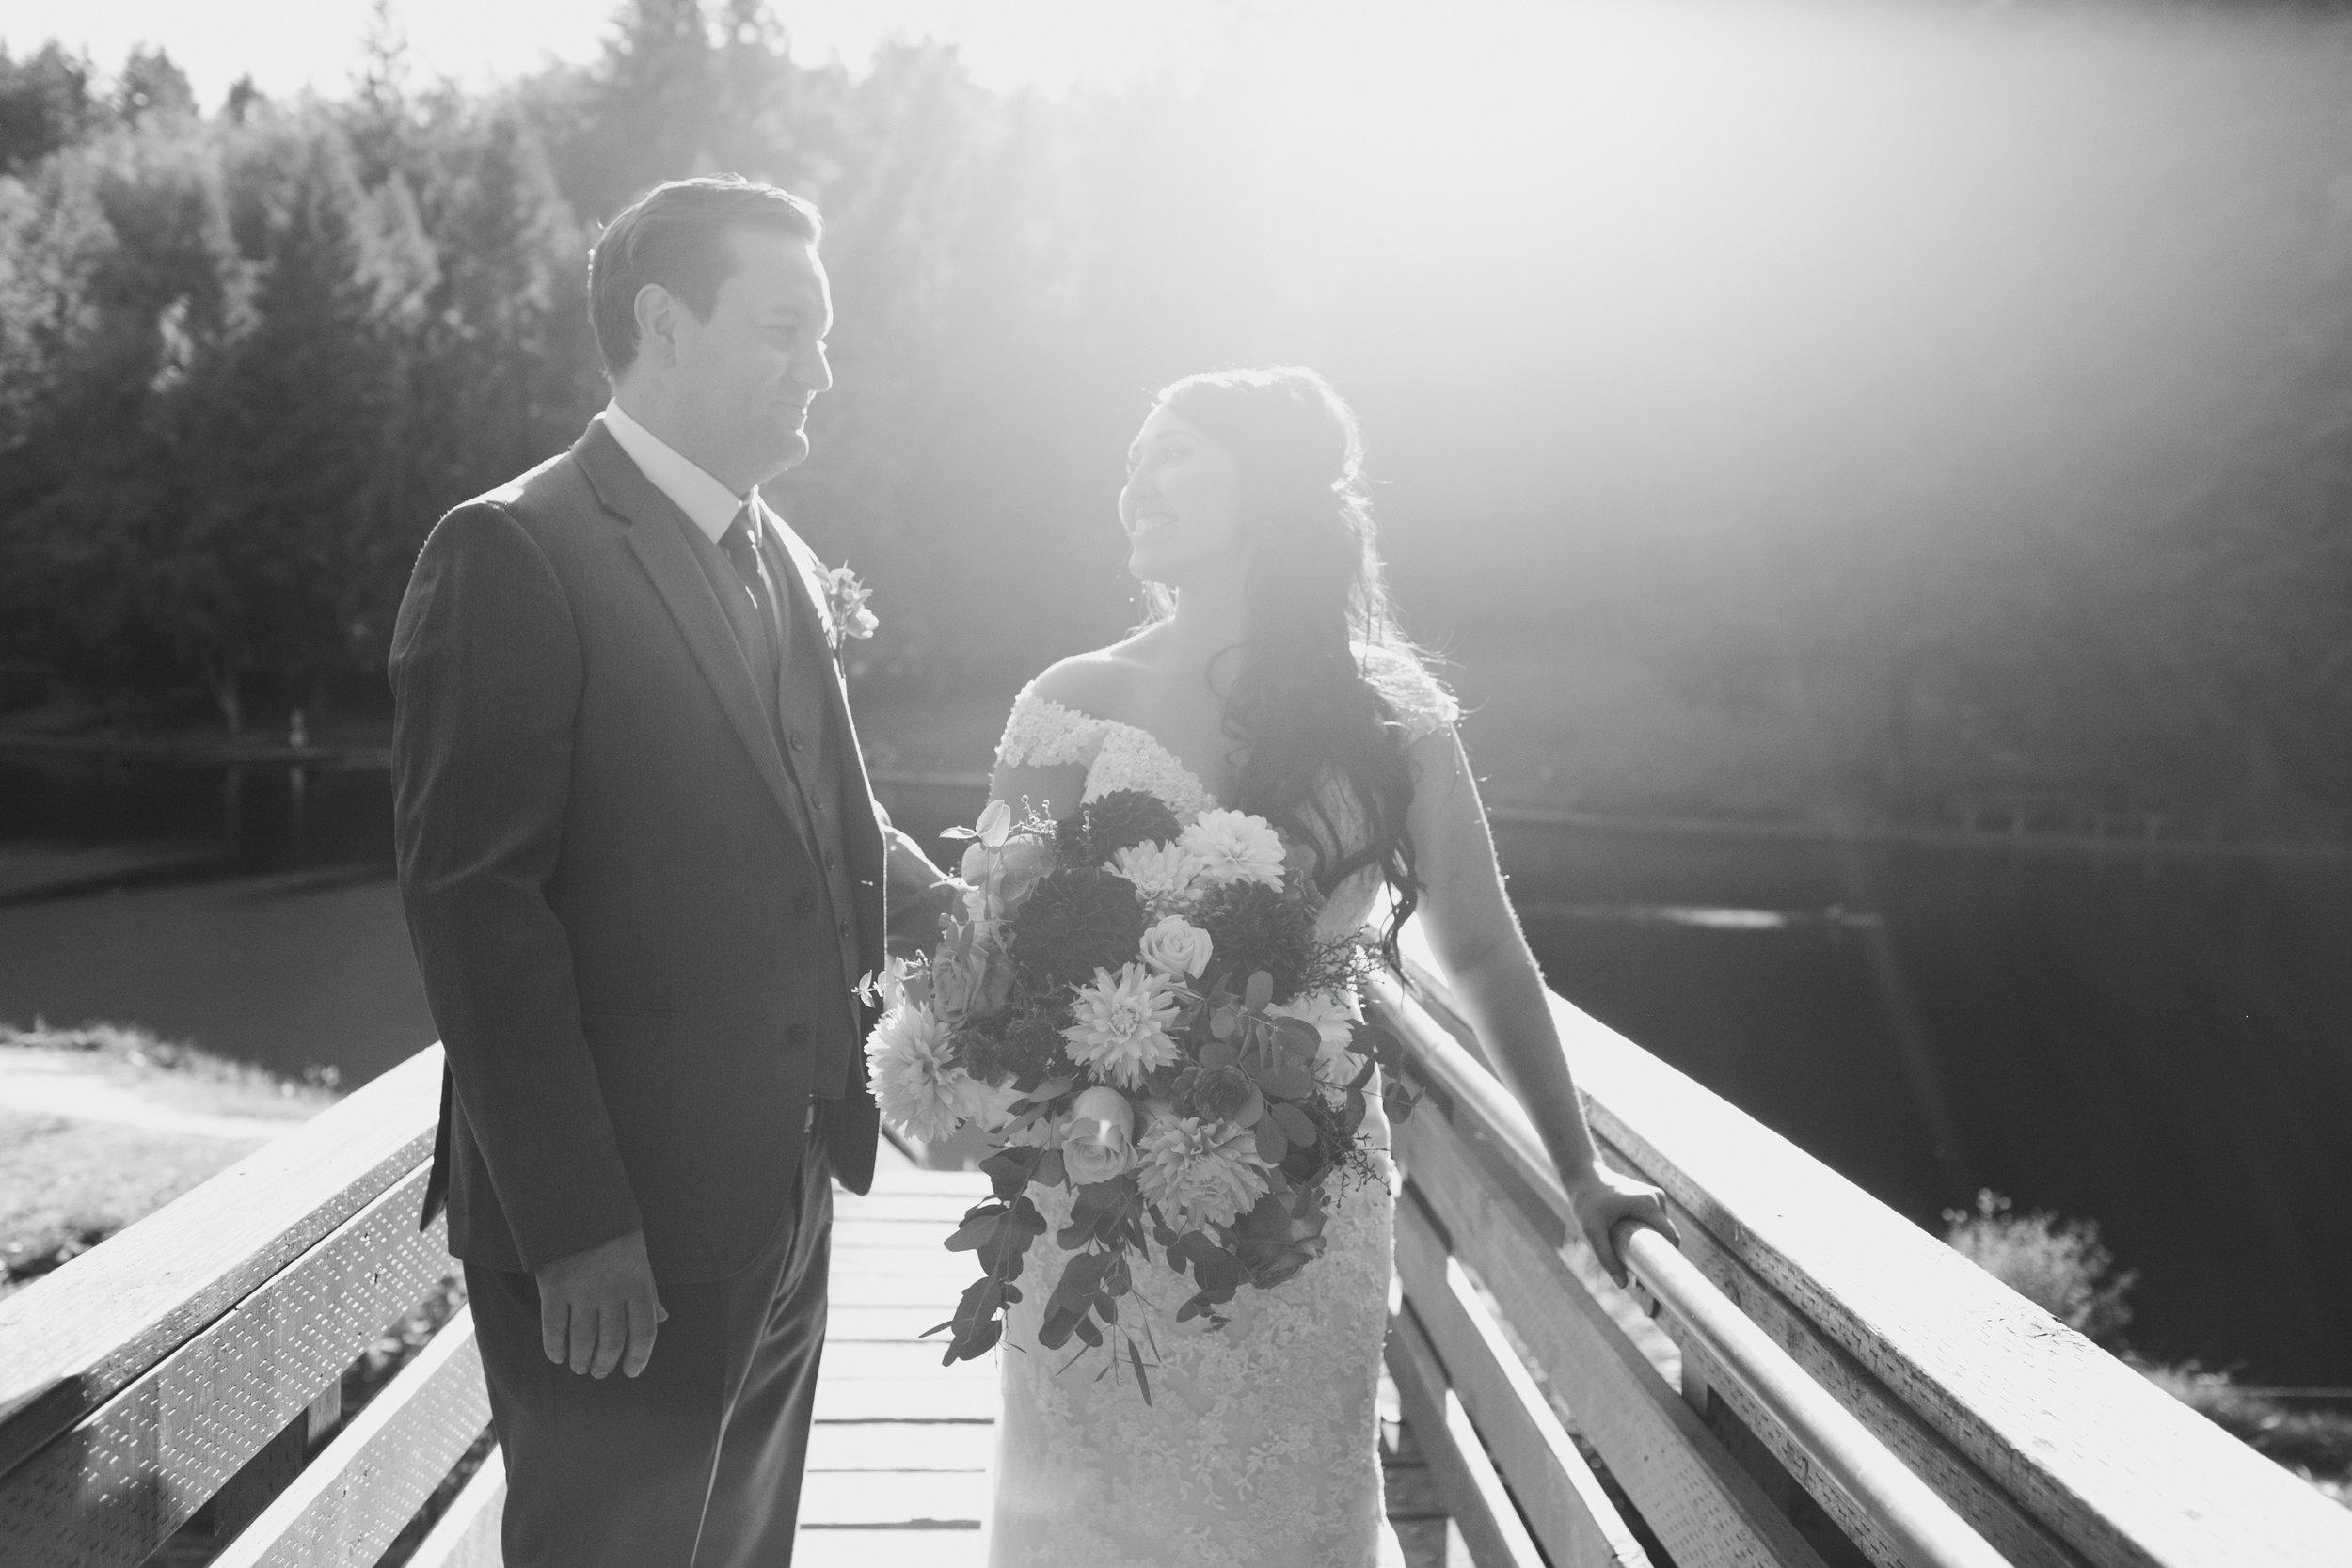 Sevlynn-Photography-Teresa-Chandler-Wedding-33.jpg